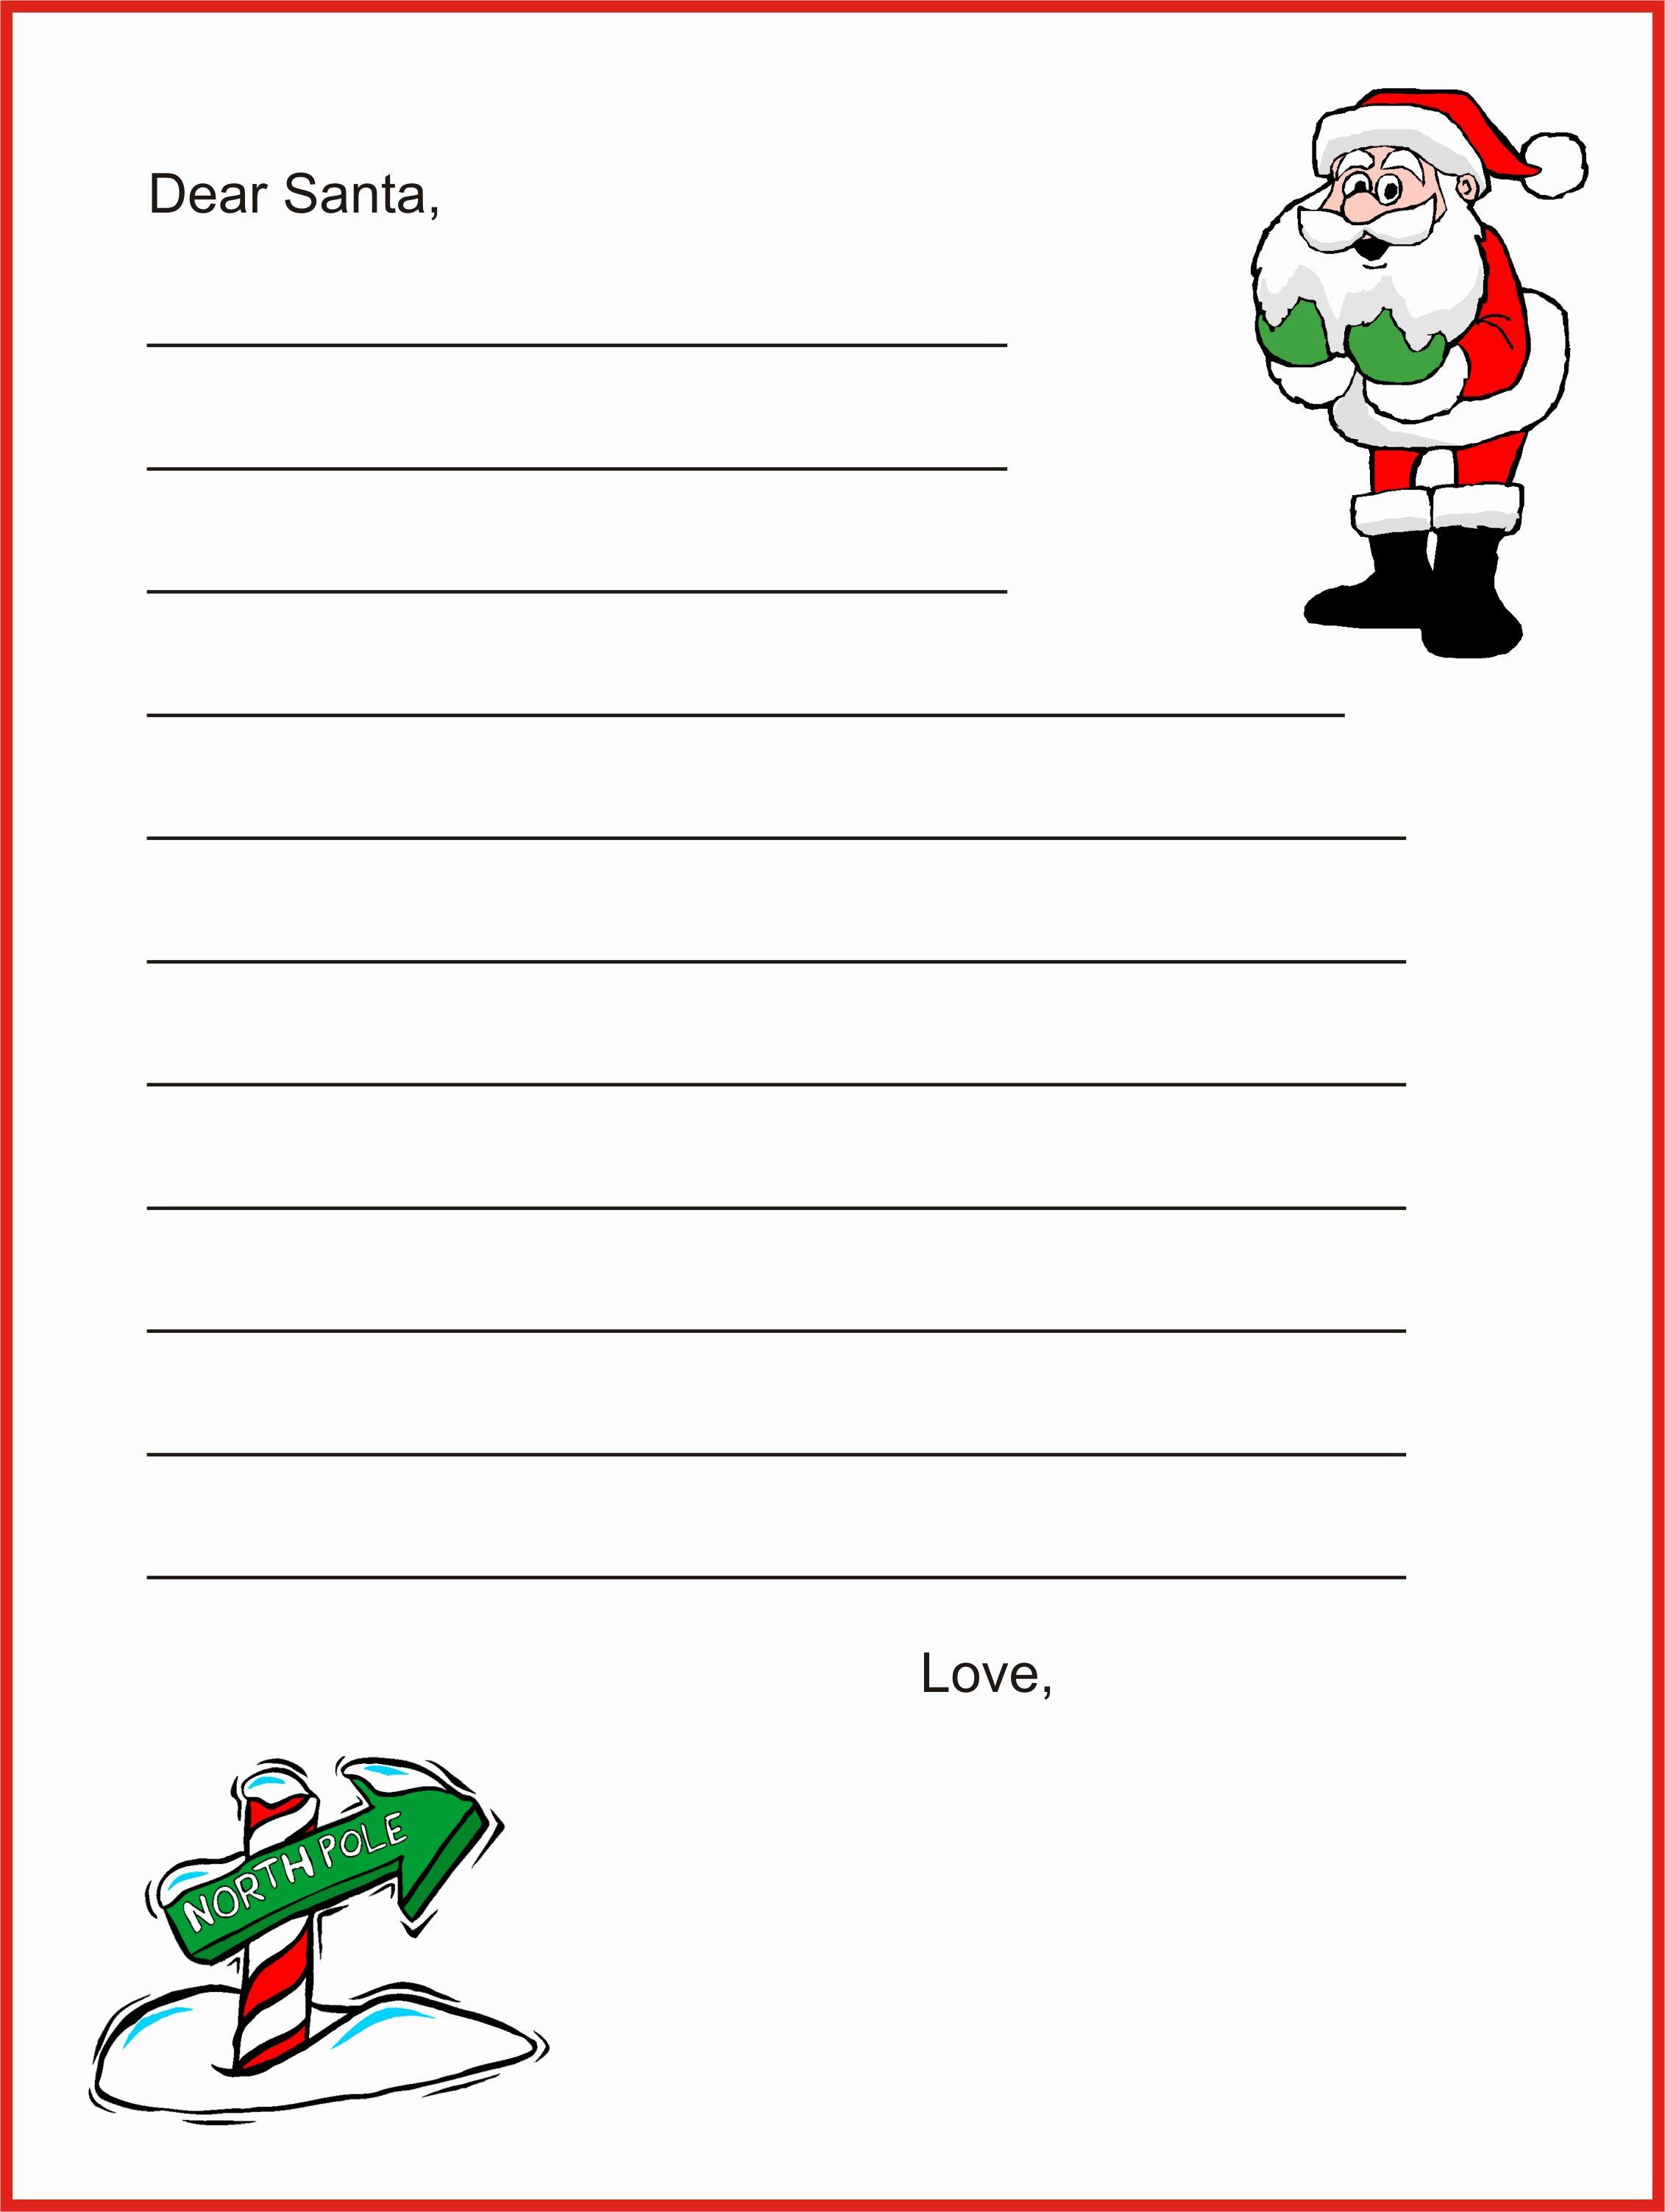 Free Santa Letter Template Elegant Dear Santa Letter Template Christmas Letter Tips